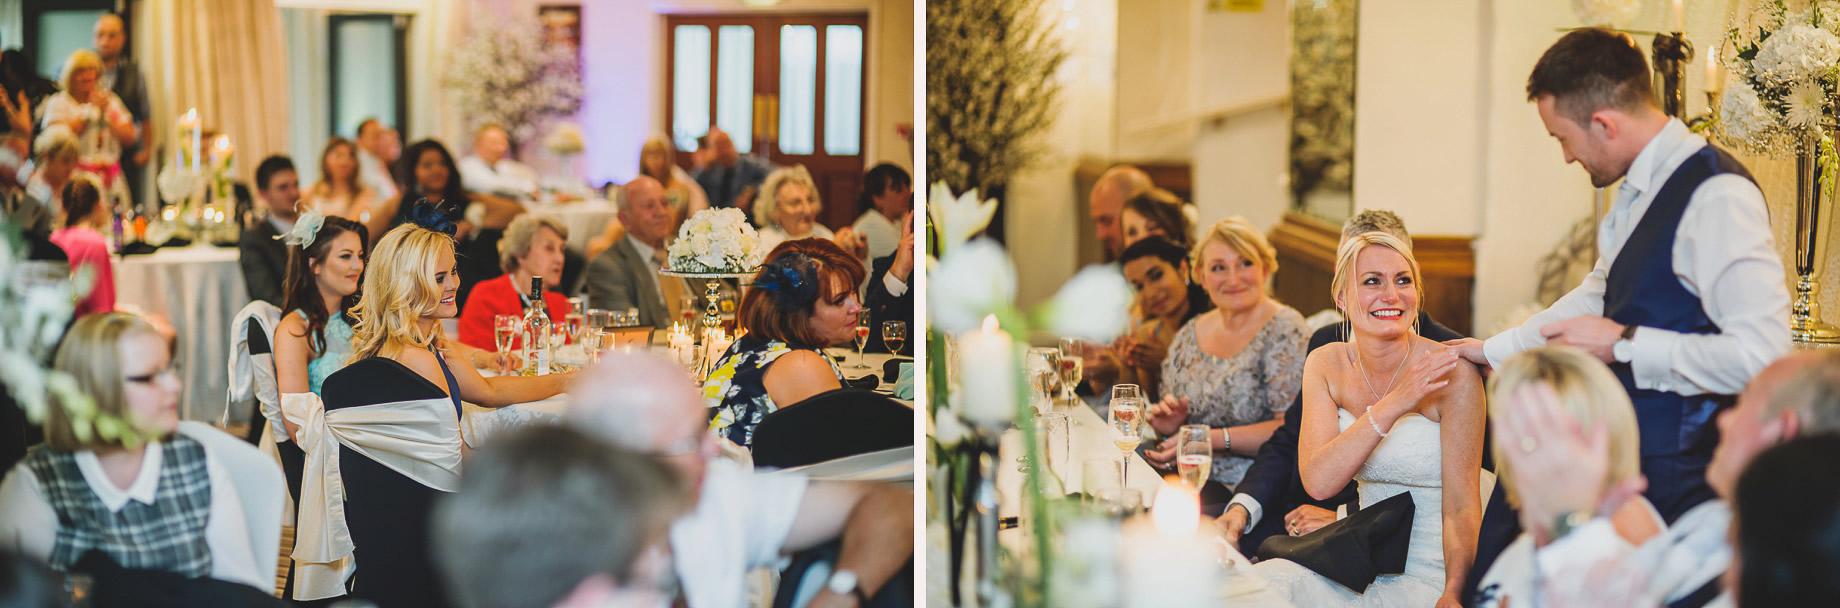 Rachel and Christian's Wedding at Holland Hall Hotel 141